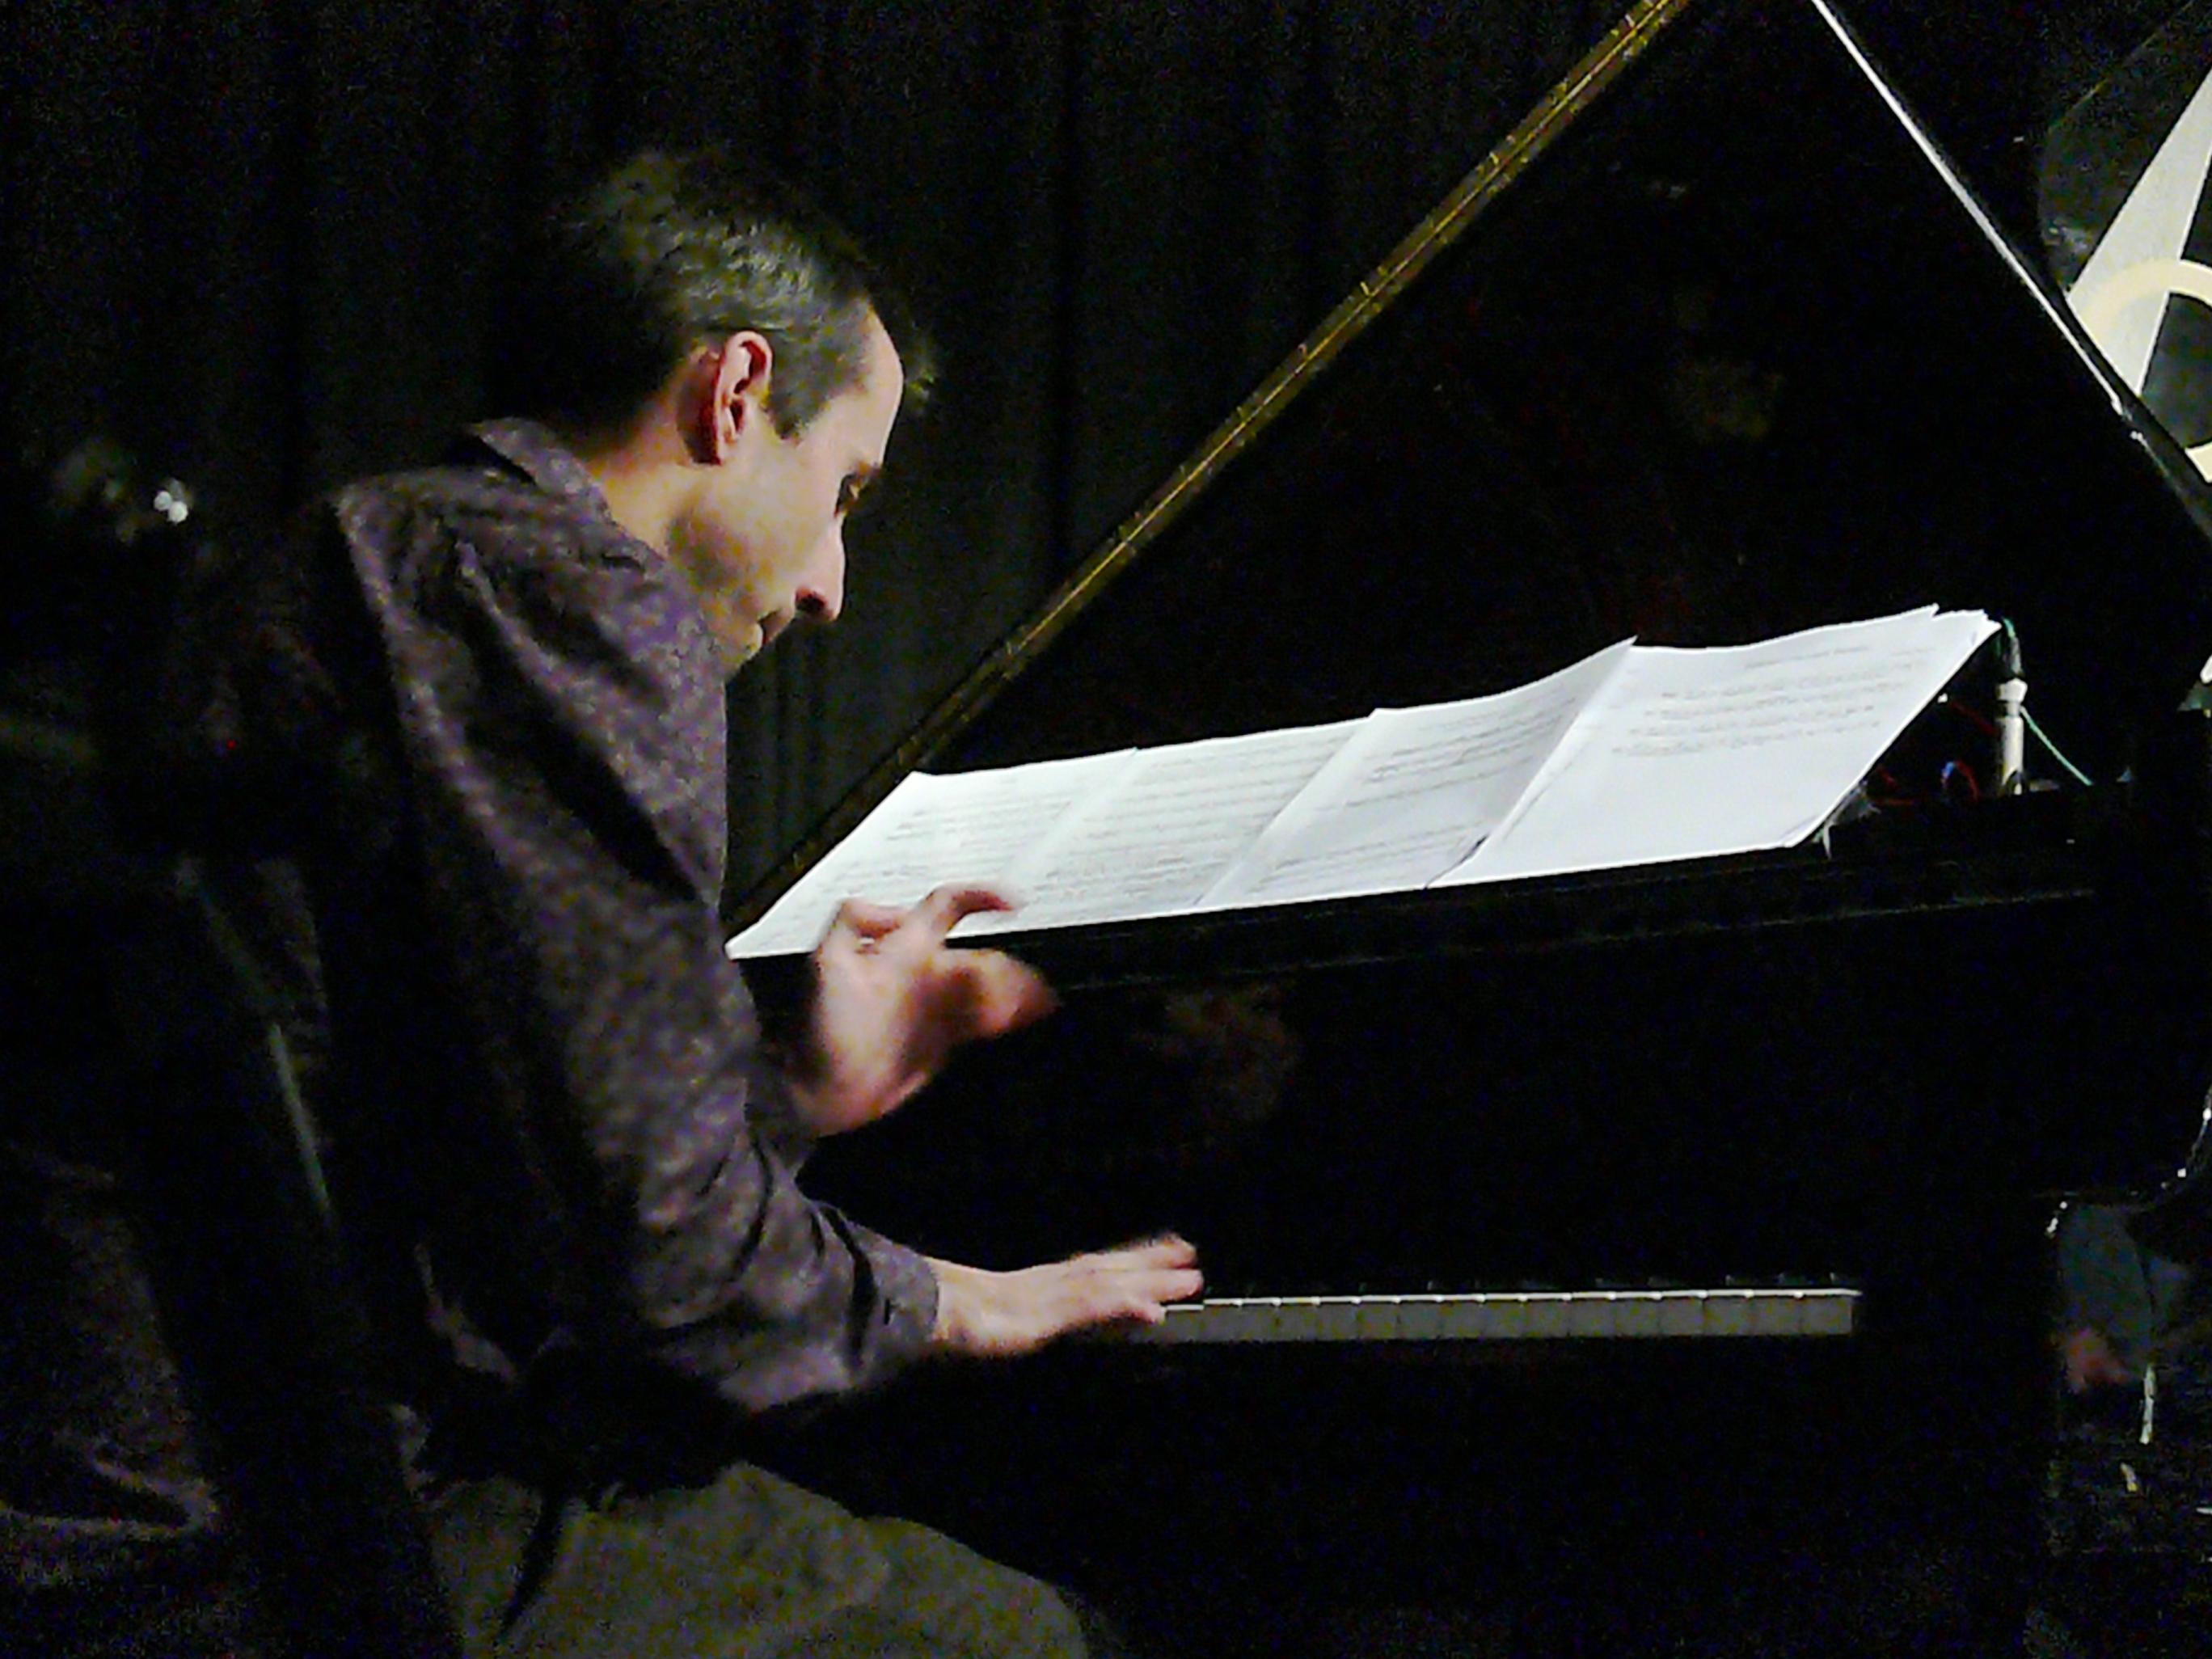 Alexander hawkins at the vortex, london in october 2013